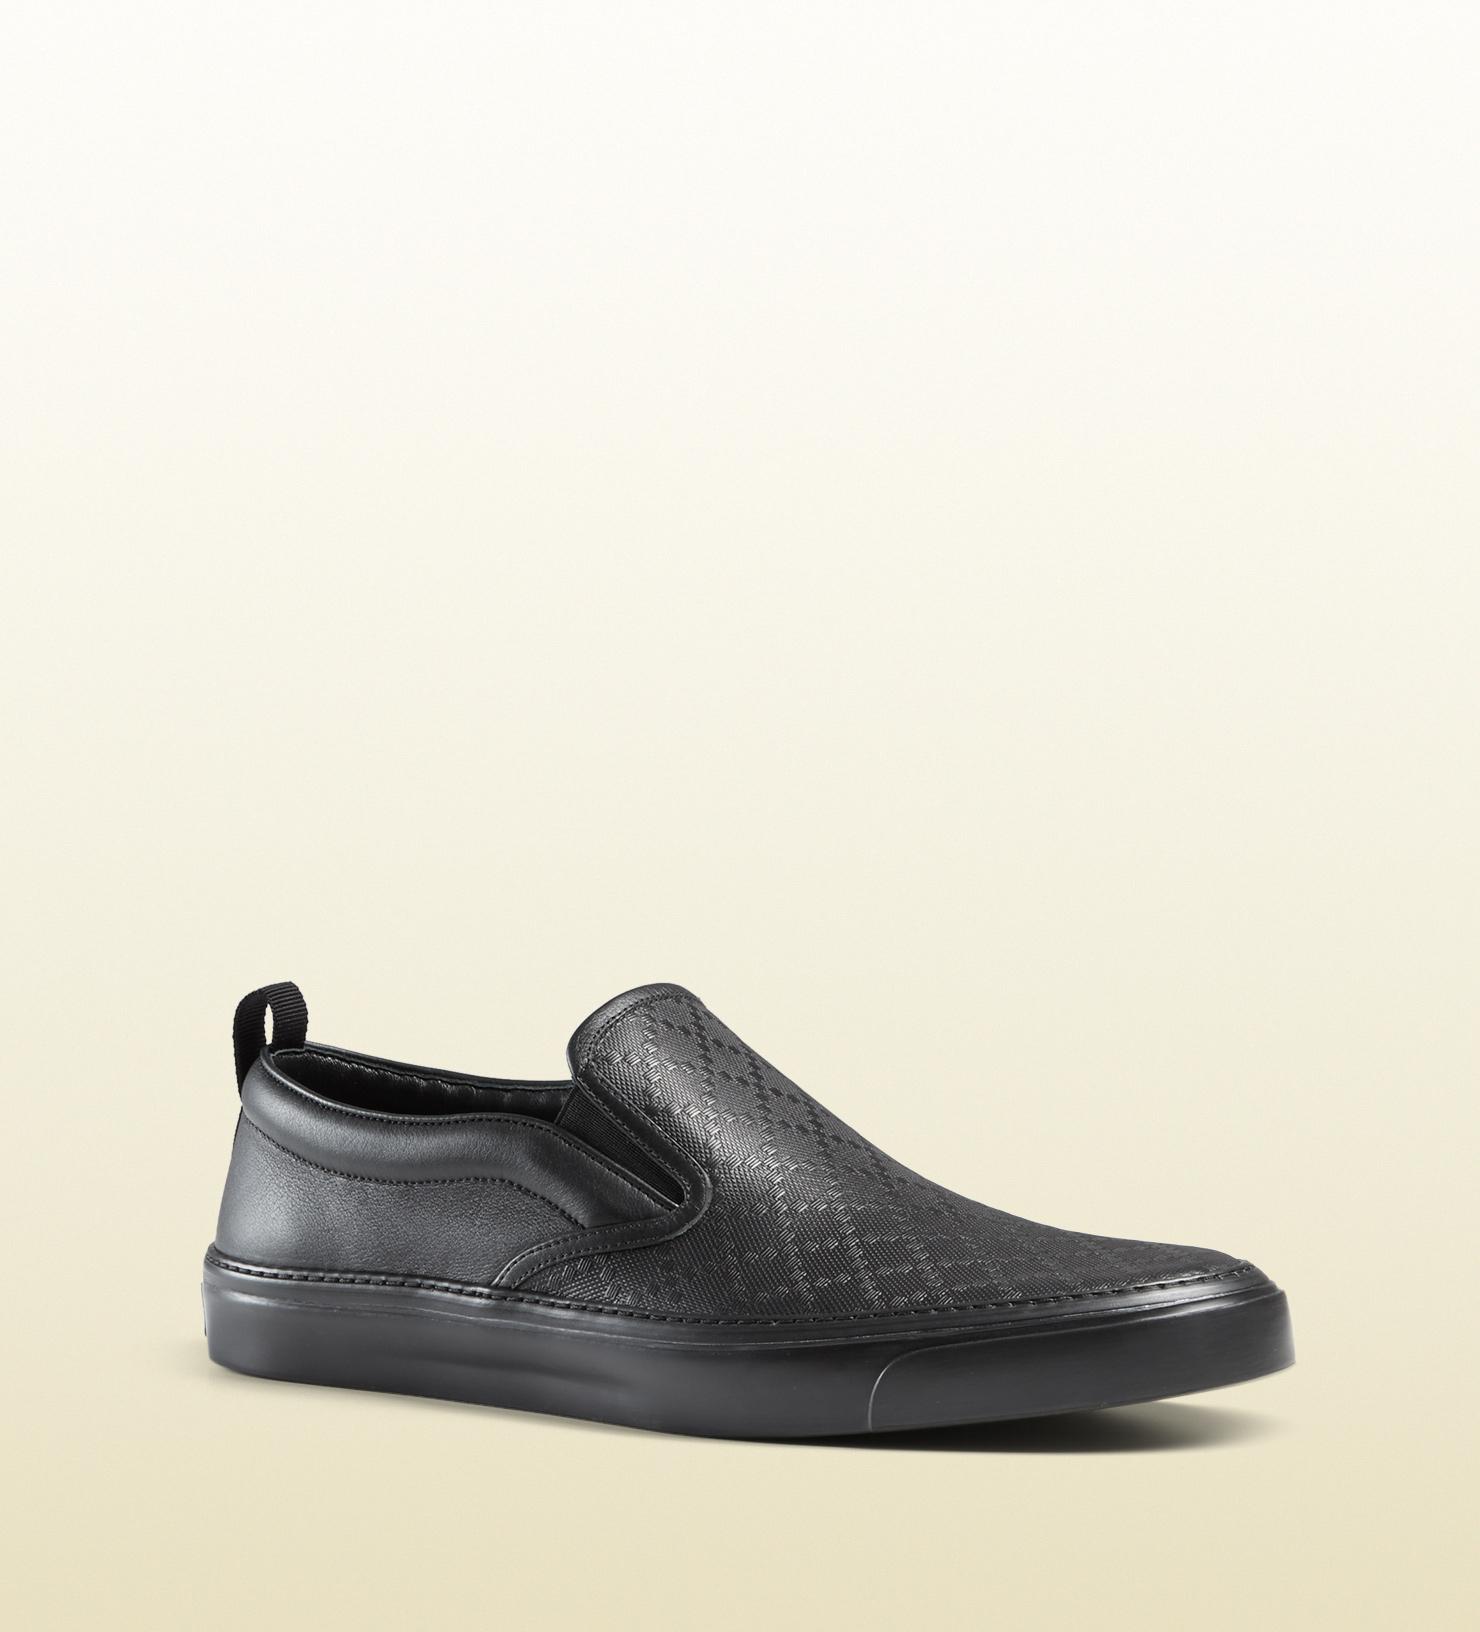 30331193d7f3 Gucci Diamante Leather Slip-on Sneaker in Black - Lyst